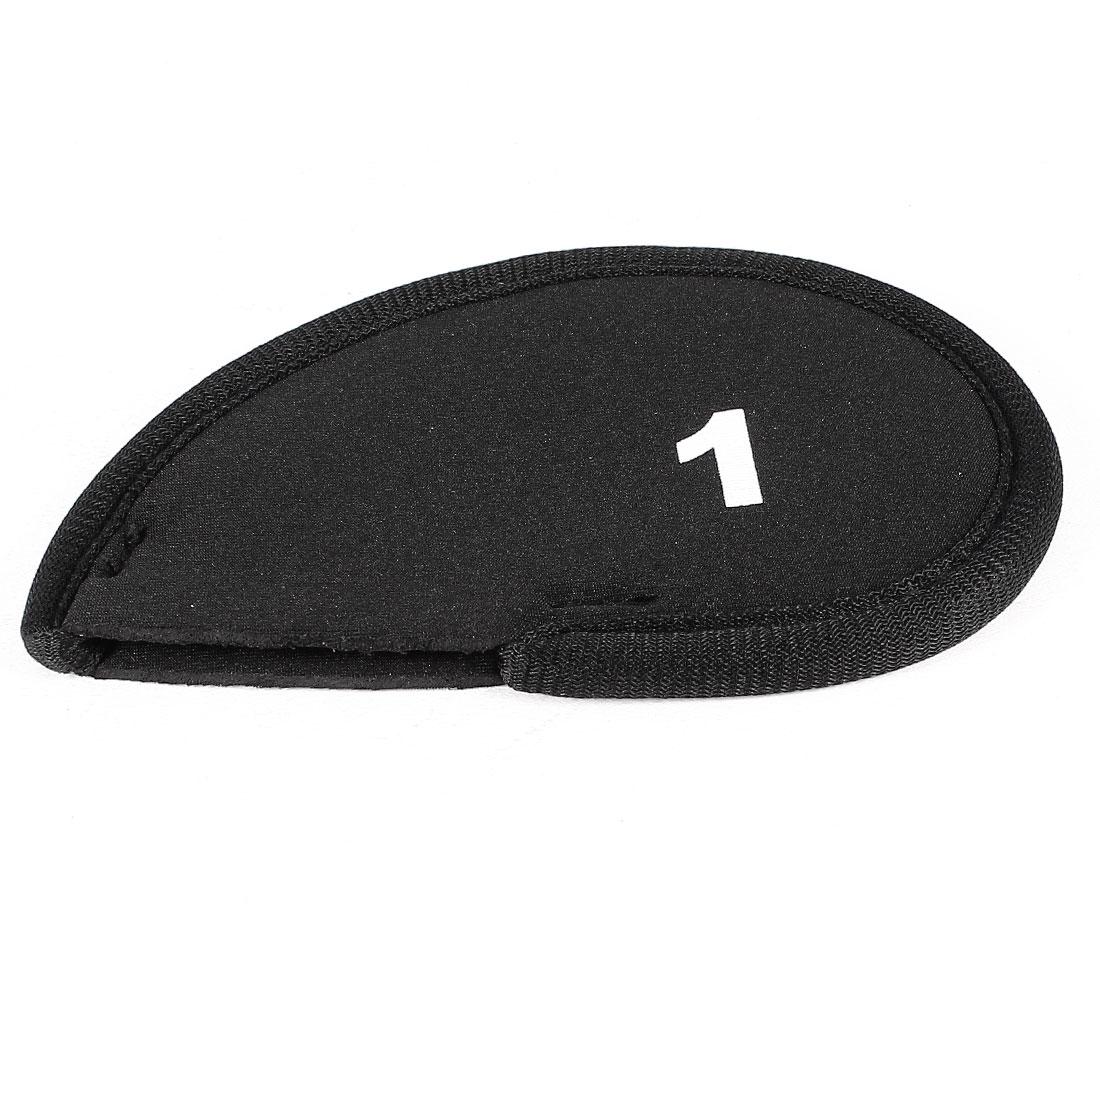 Black Neoprene Golf Club Head Cover 1 2 Wedge Iron Protective Headcovers